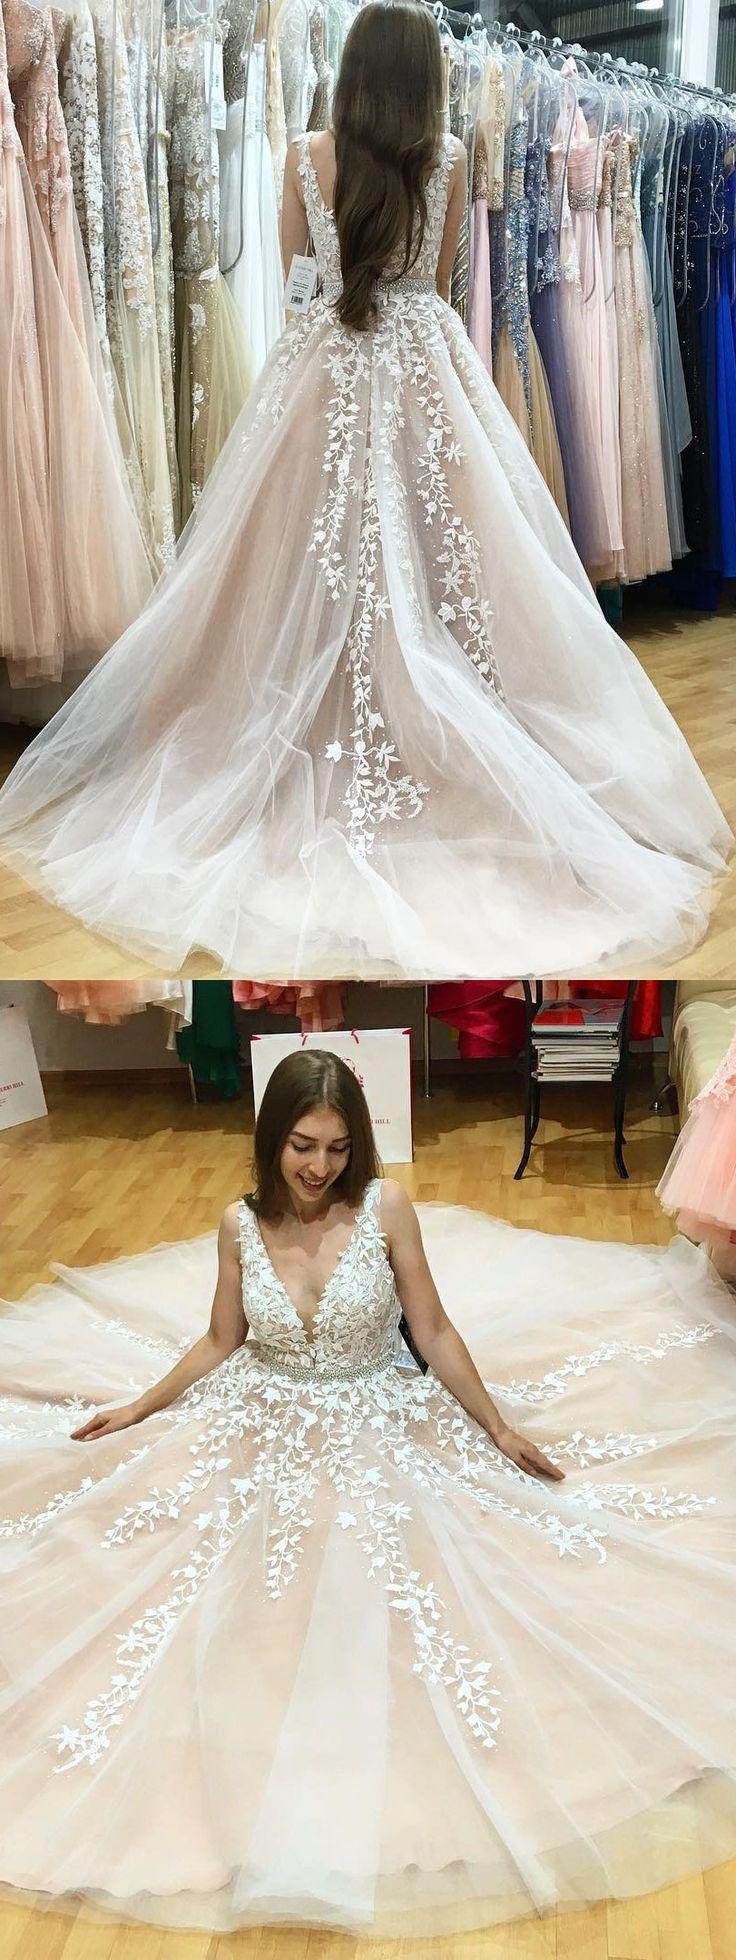 Elegant A-Line V-Neck Sleeveless Appliques Long Prom Dress @veenrol